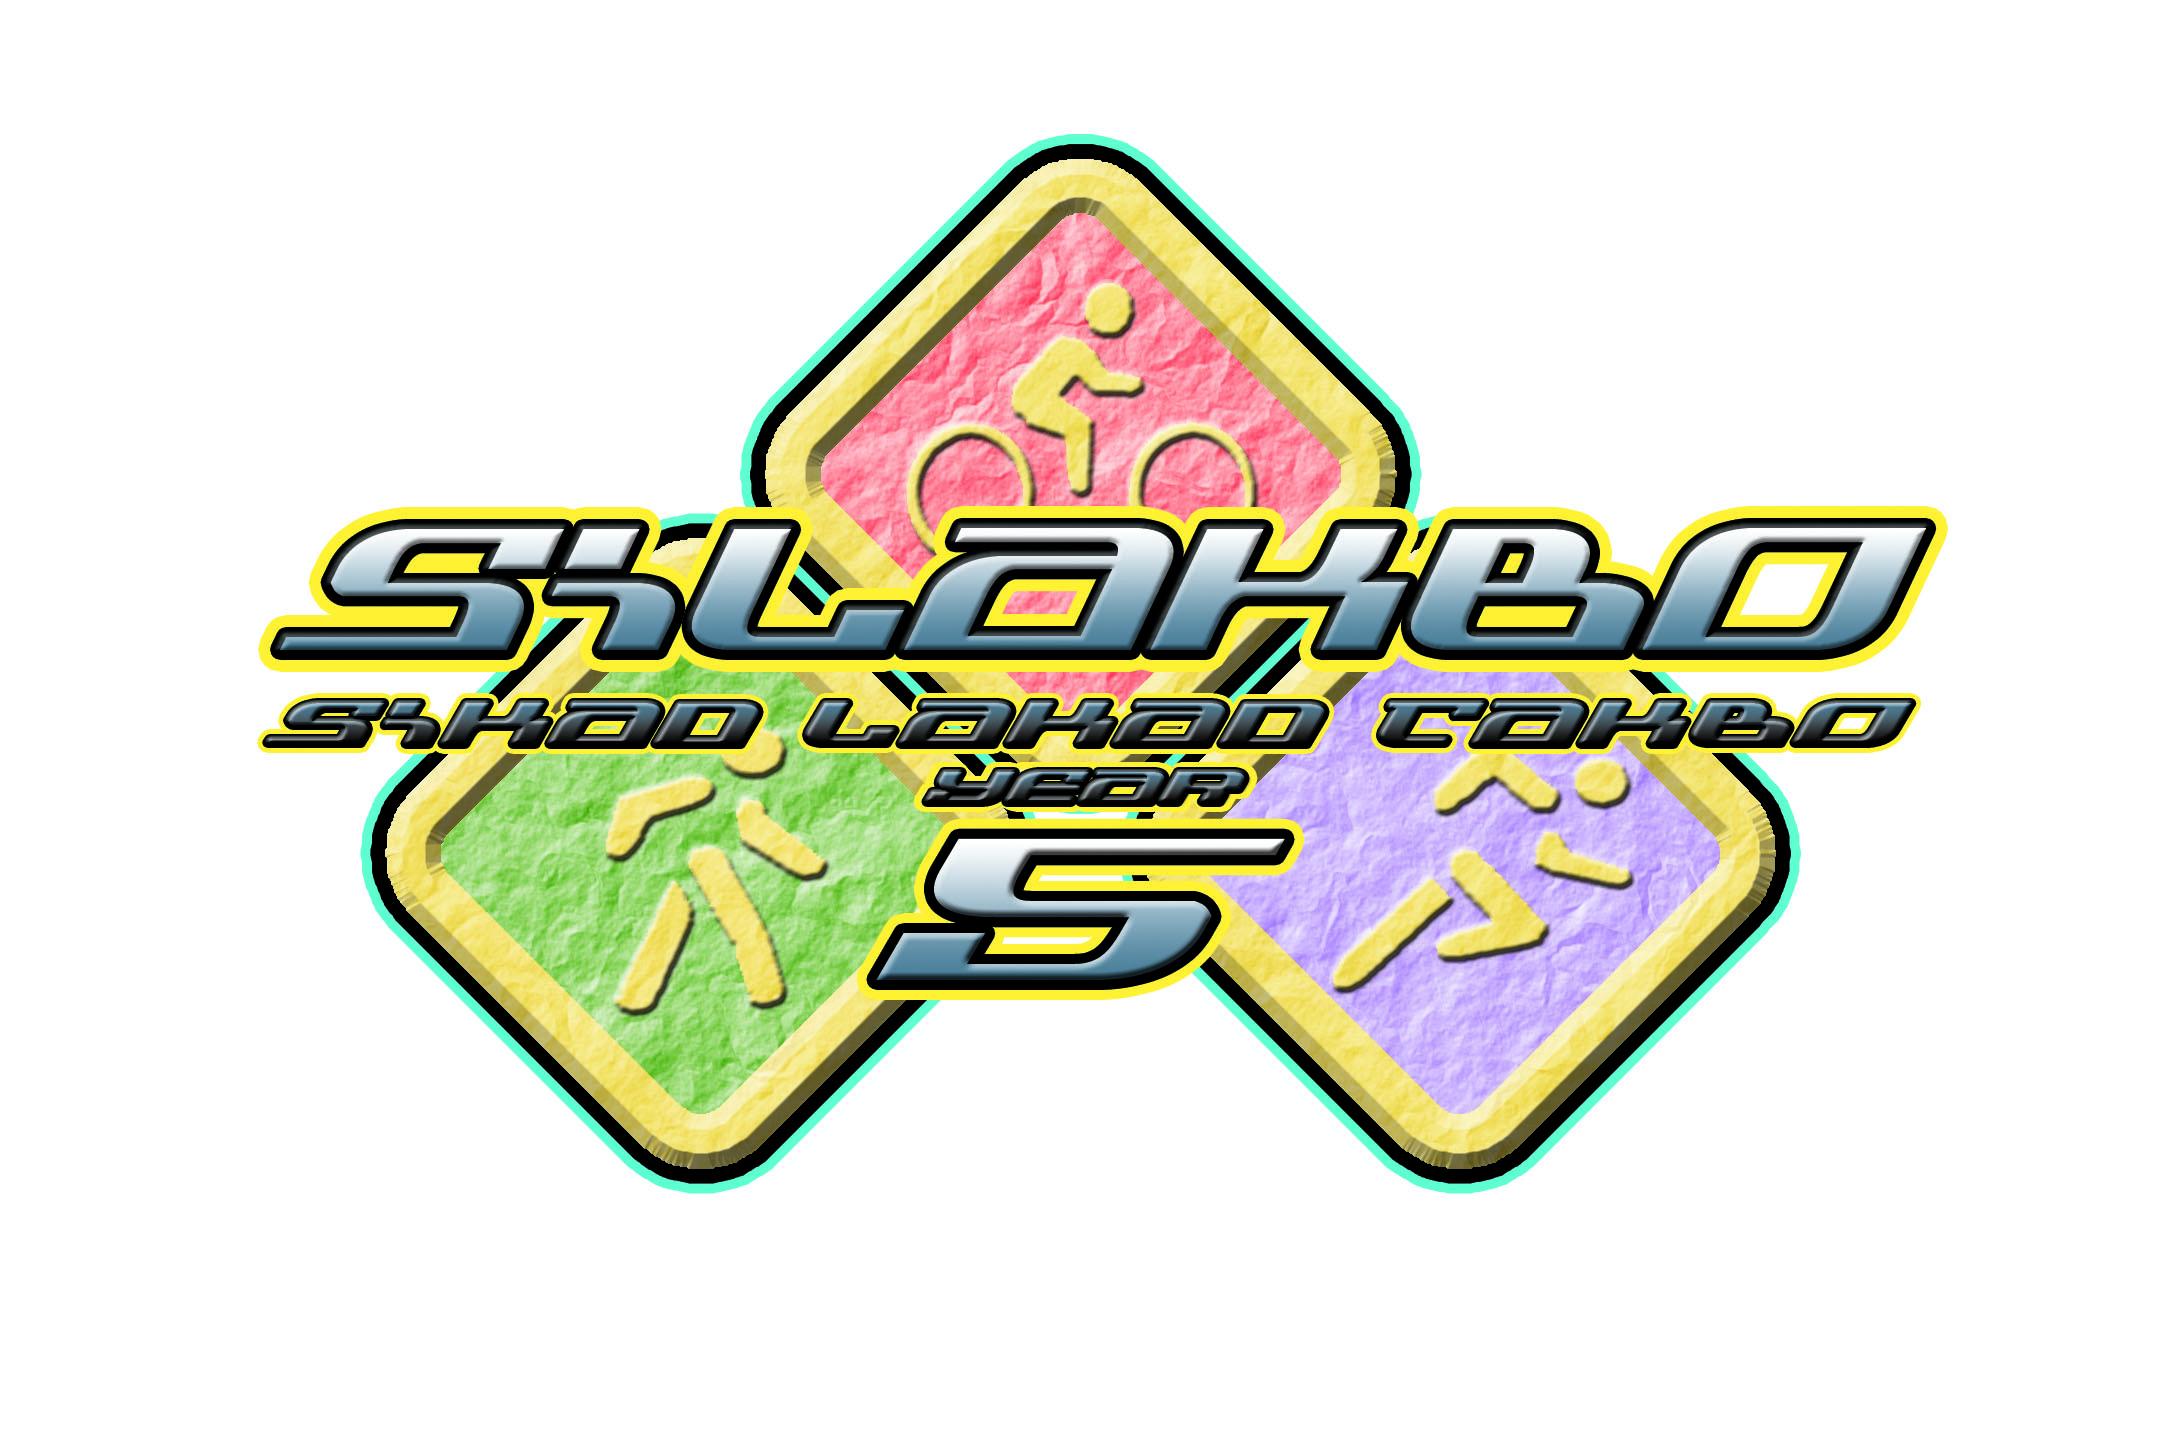 silakbo-half-marathon-2013-latest-poster